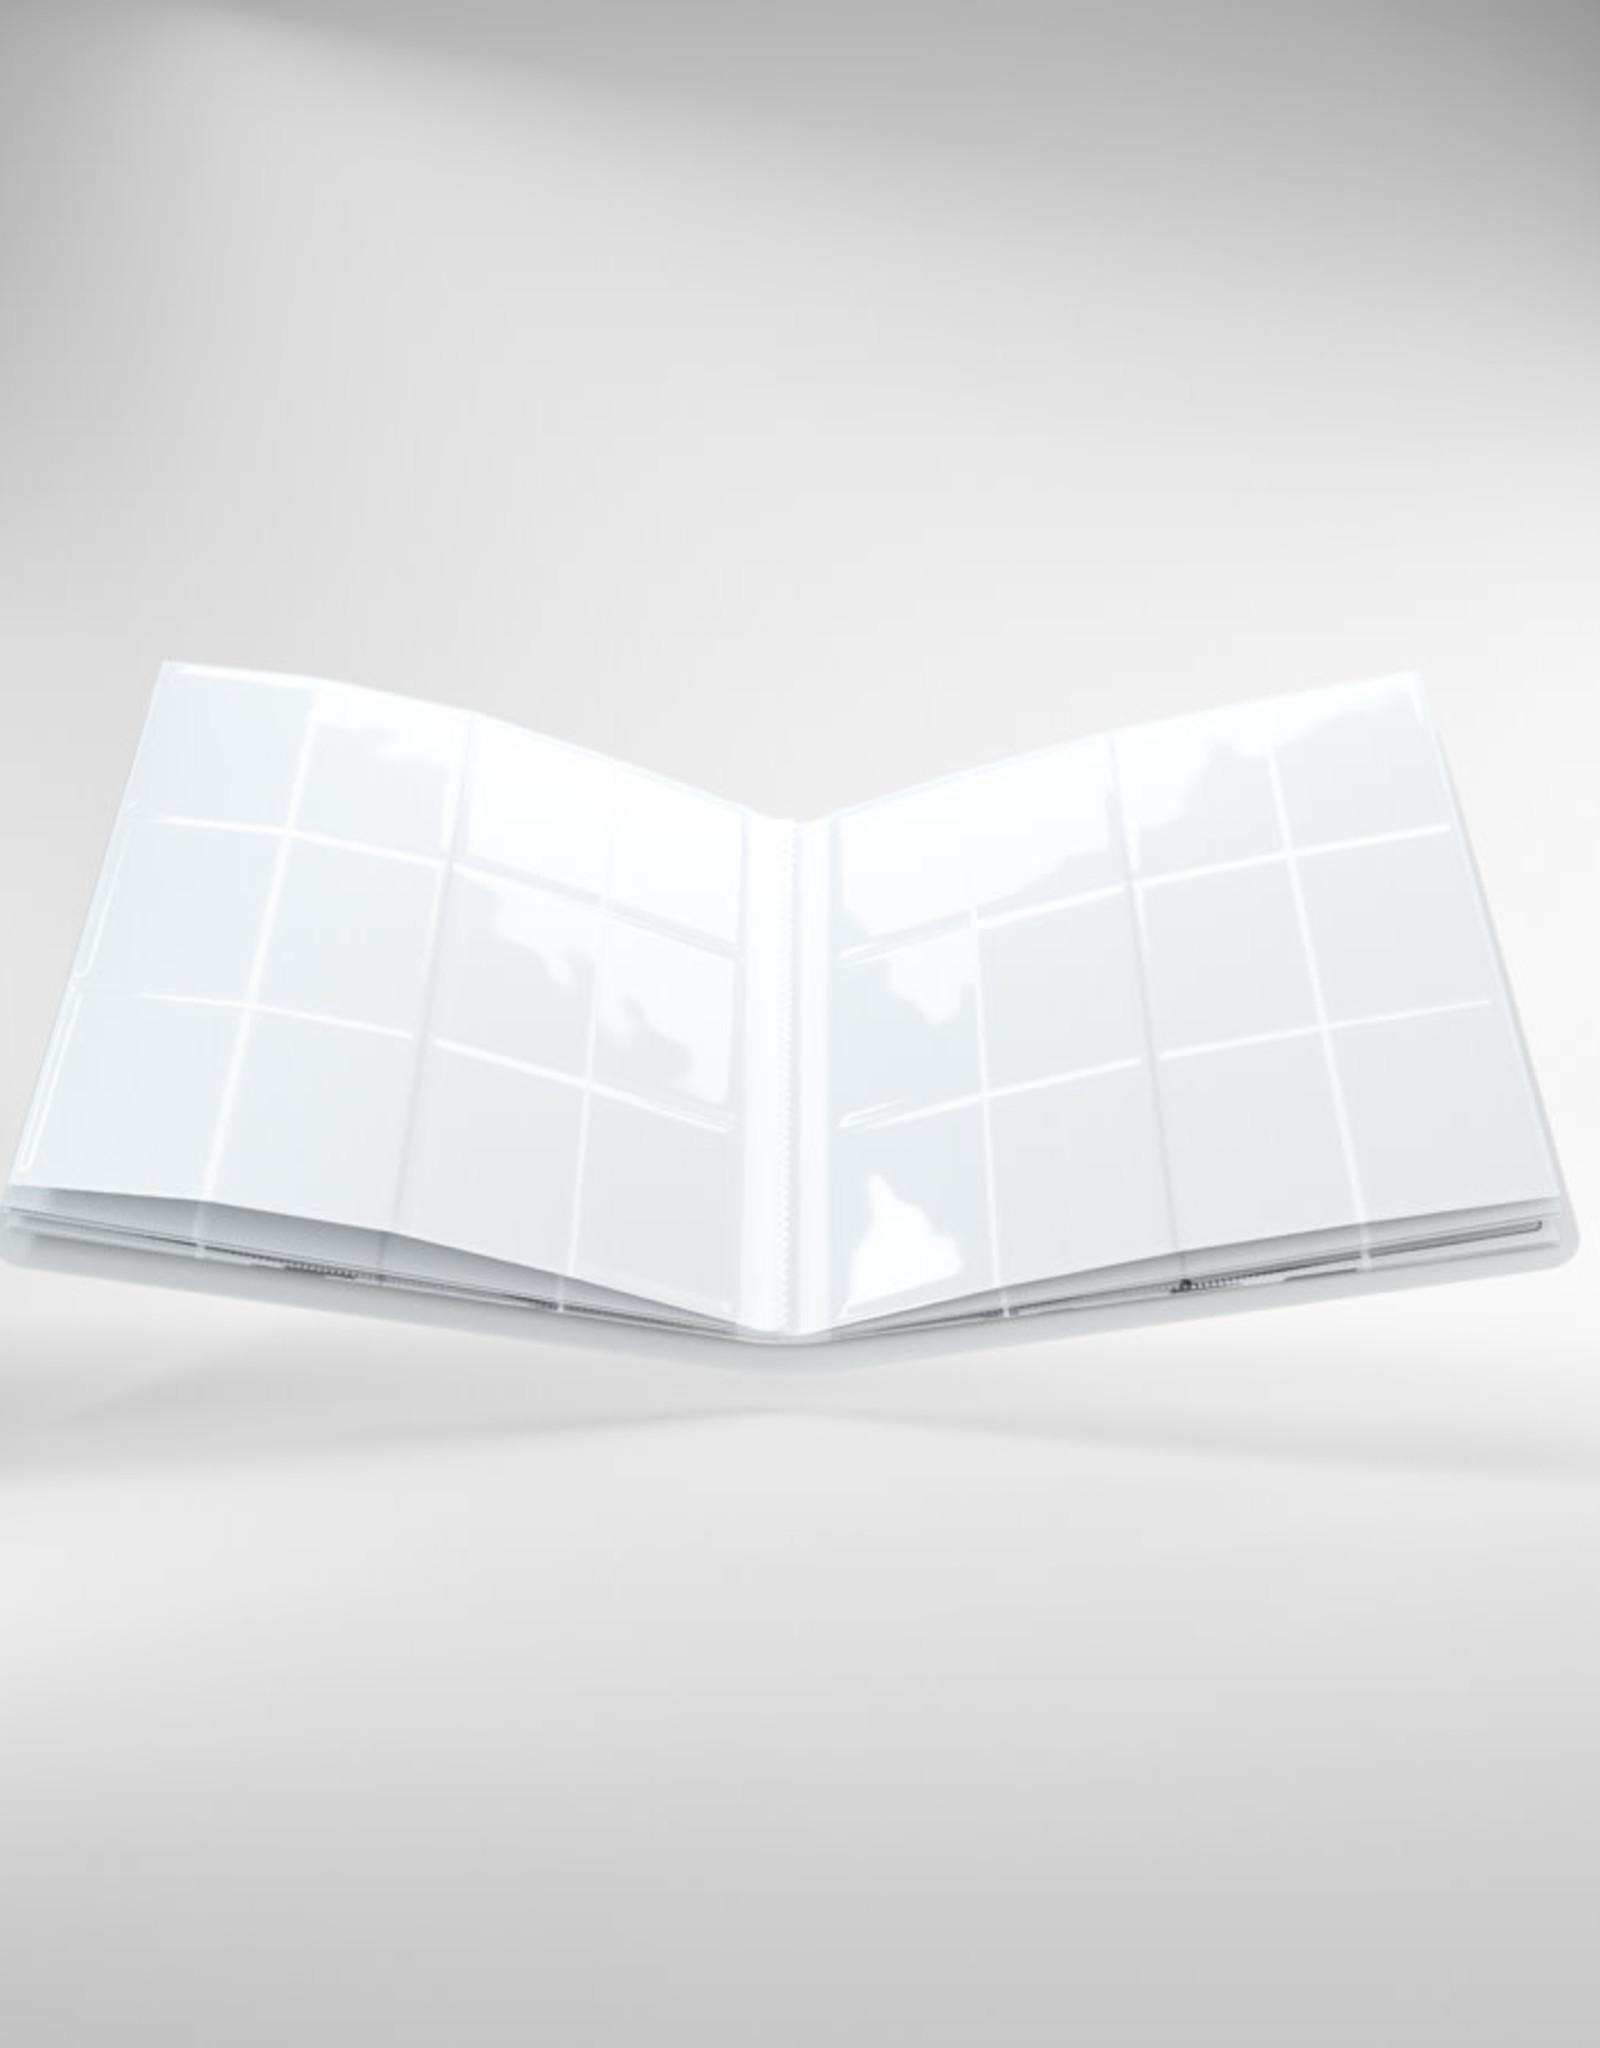 Casual Album:  24-Pocket Side-Loading White